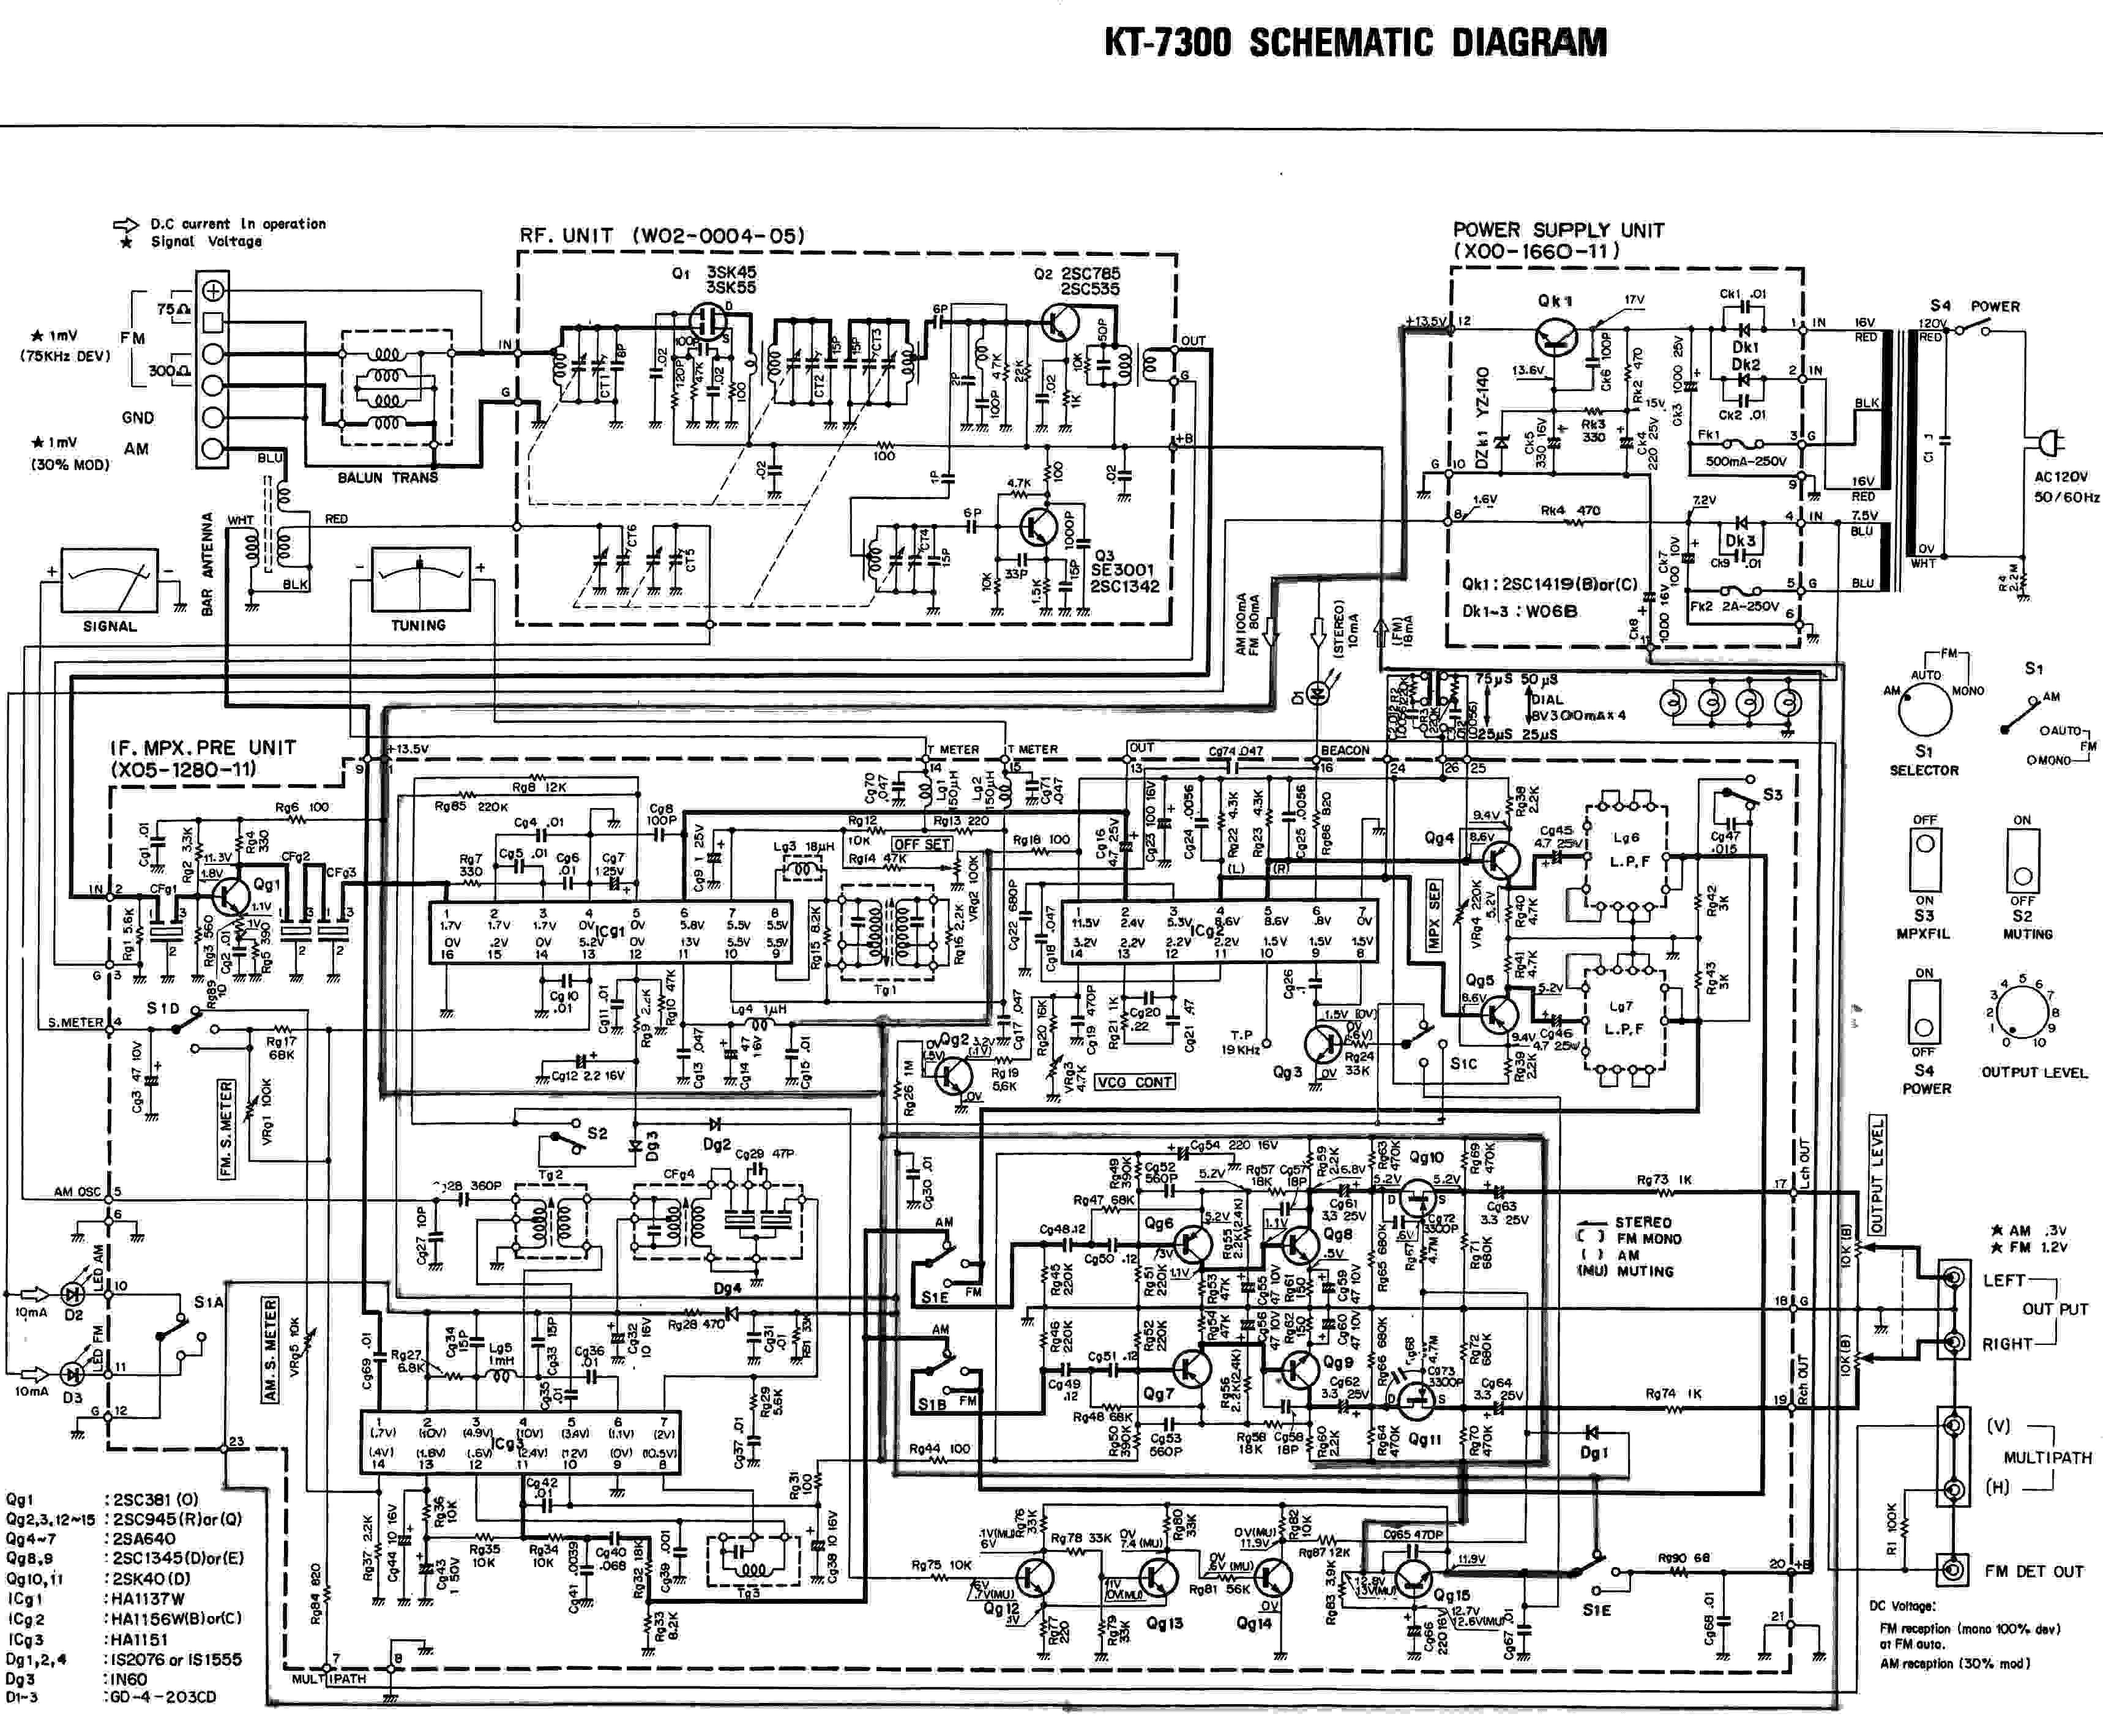 25 Honeywell Th9421c1004 Wiring Diagram